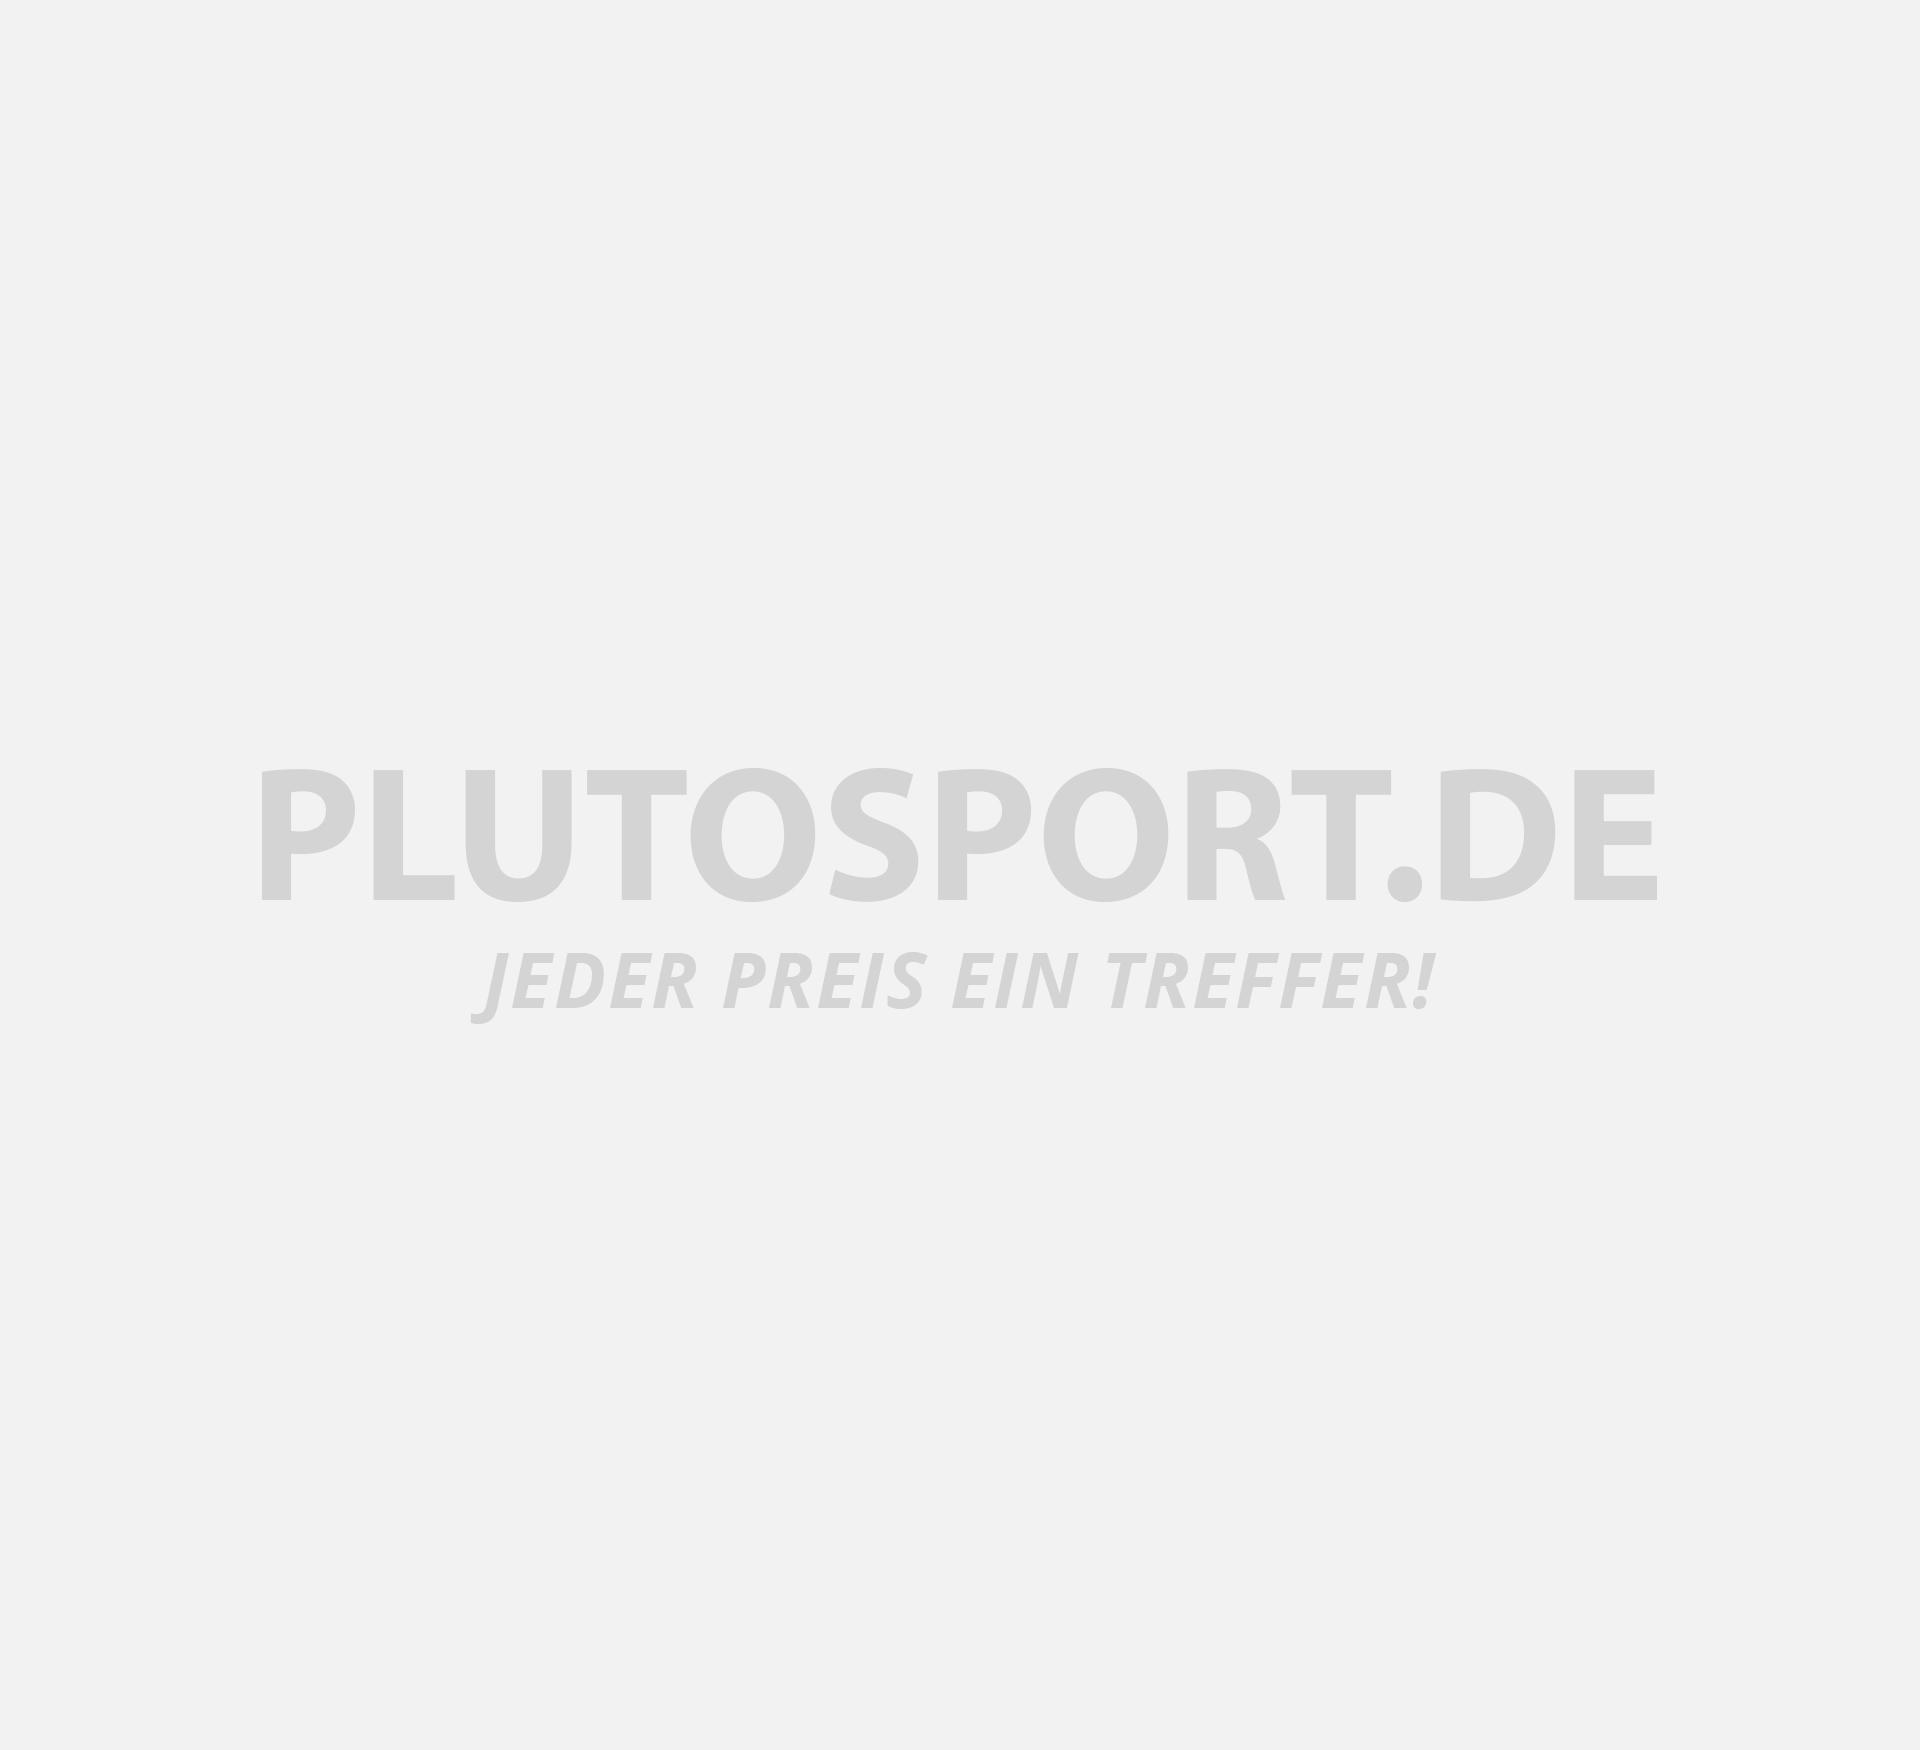 Reusch Attrakt Solid Torwarthandschuhe Senior